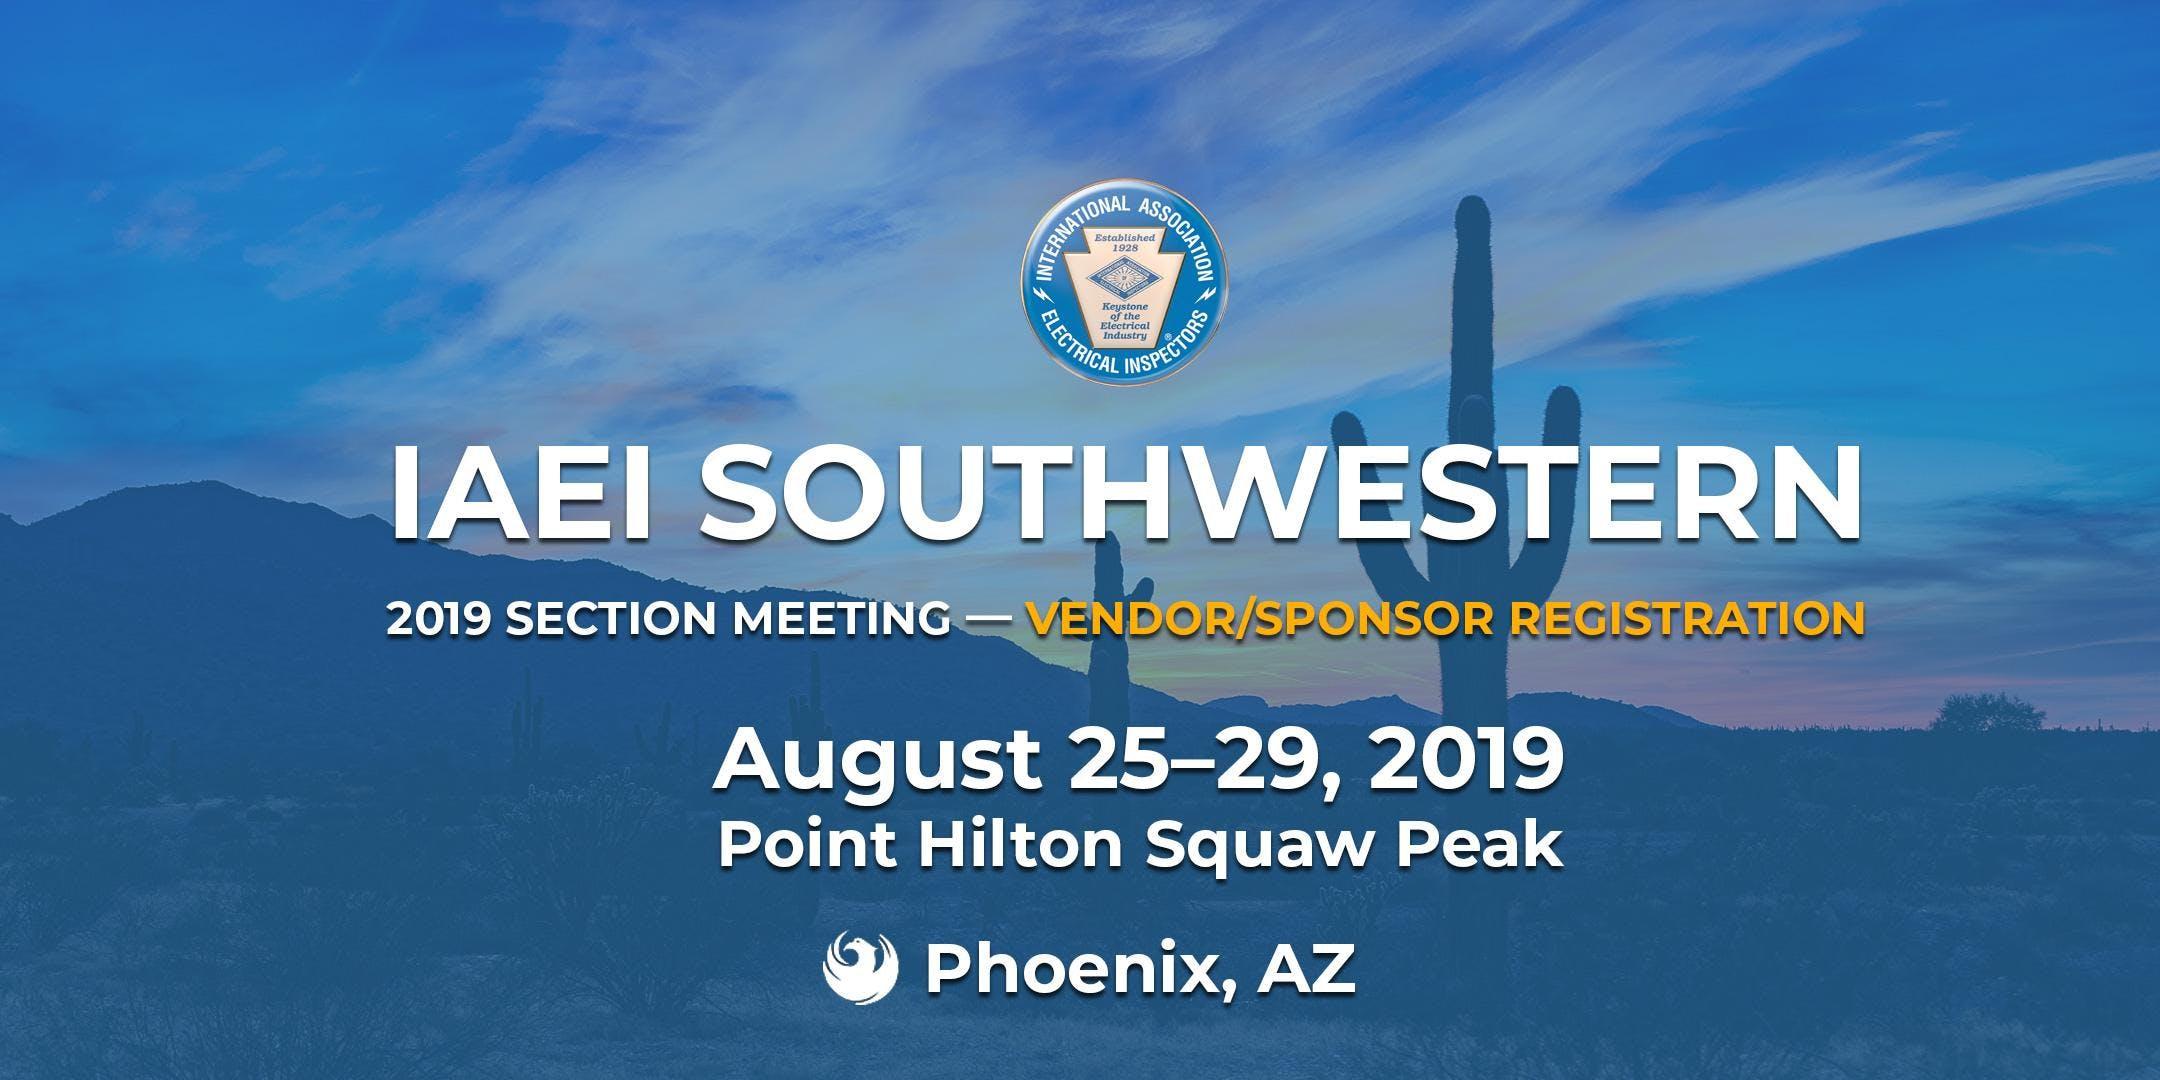 IAEI Southwestern 2019 Annual Section Meeting — Vendor Registration